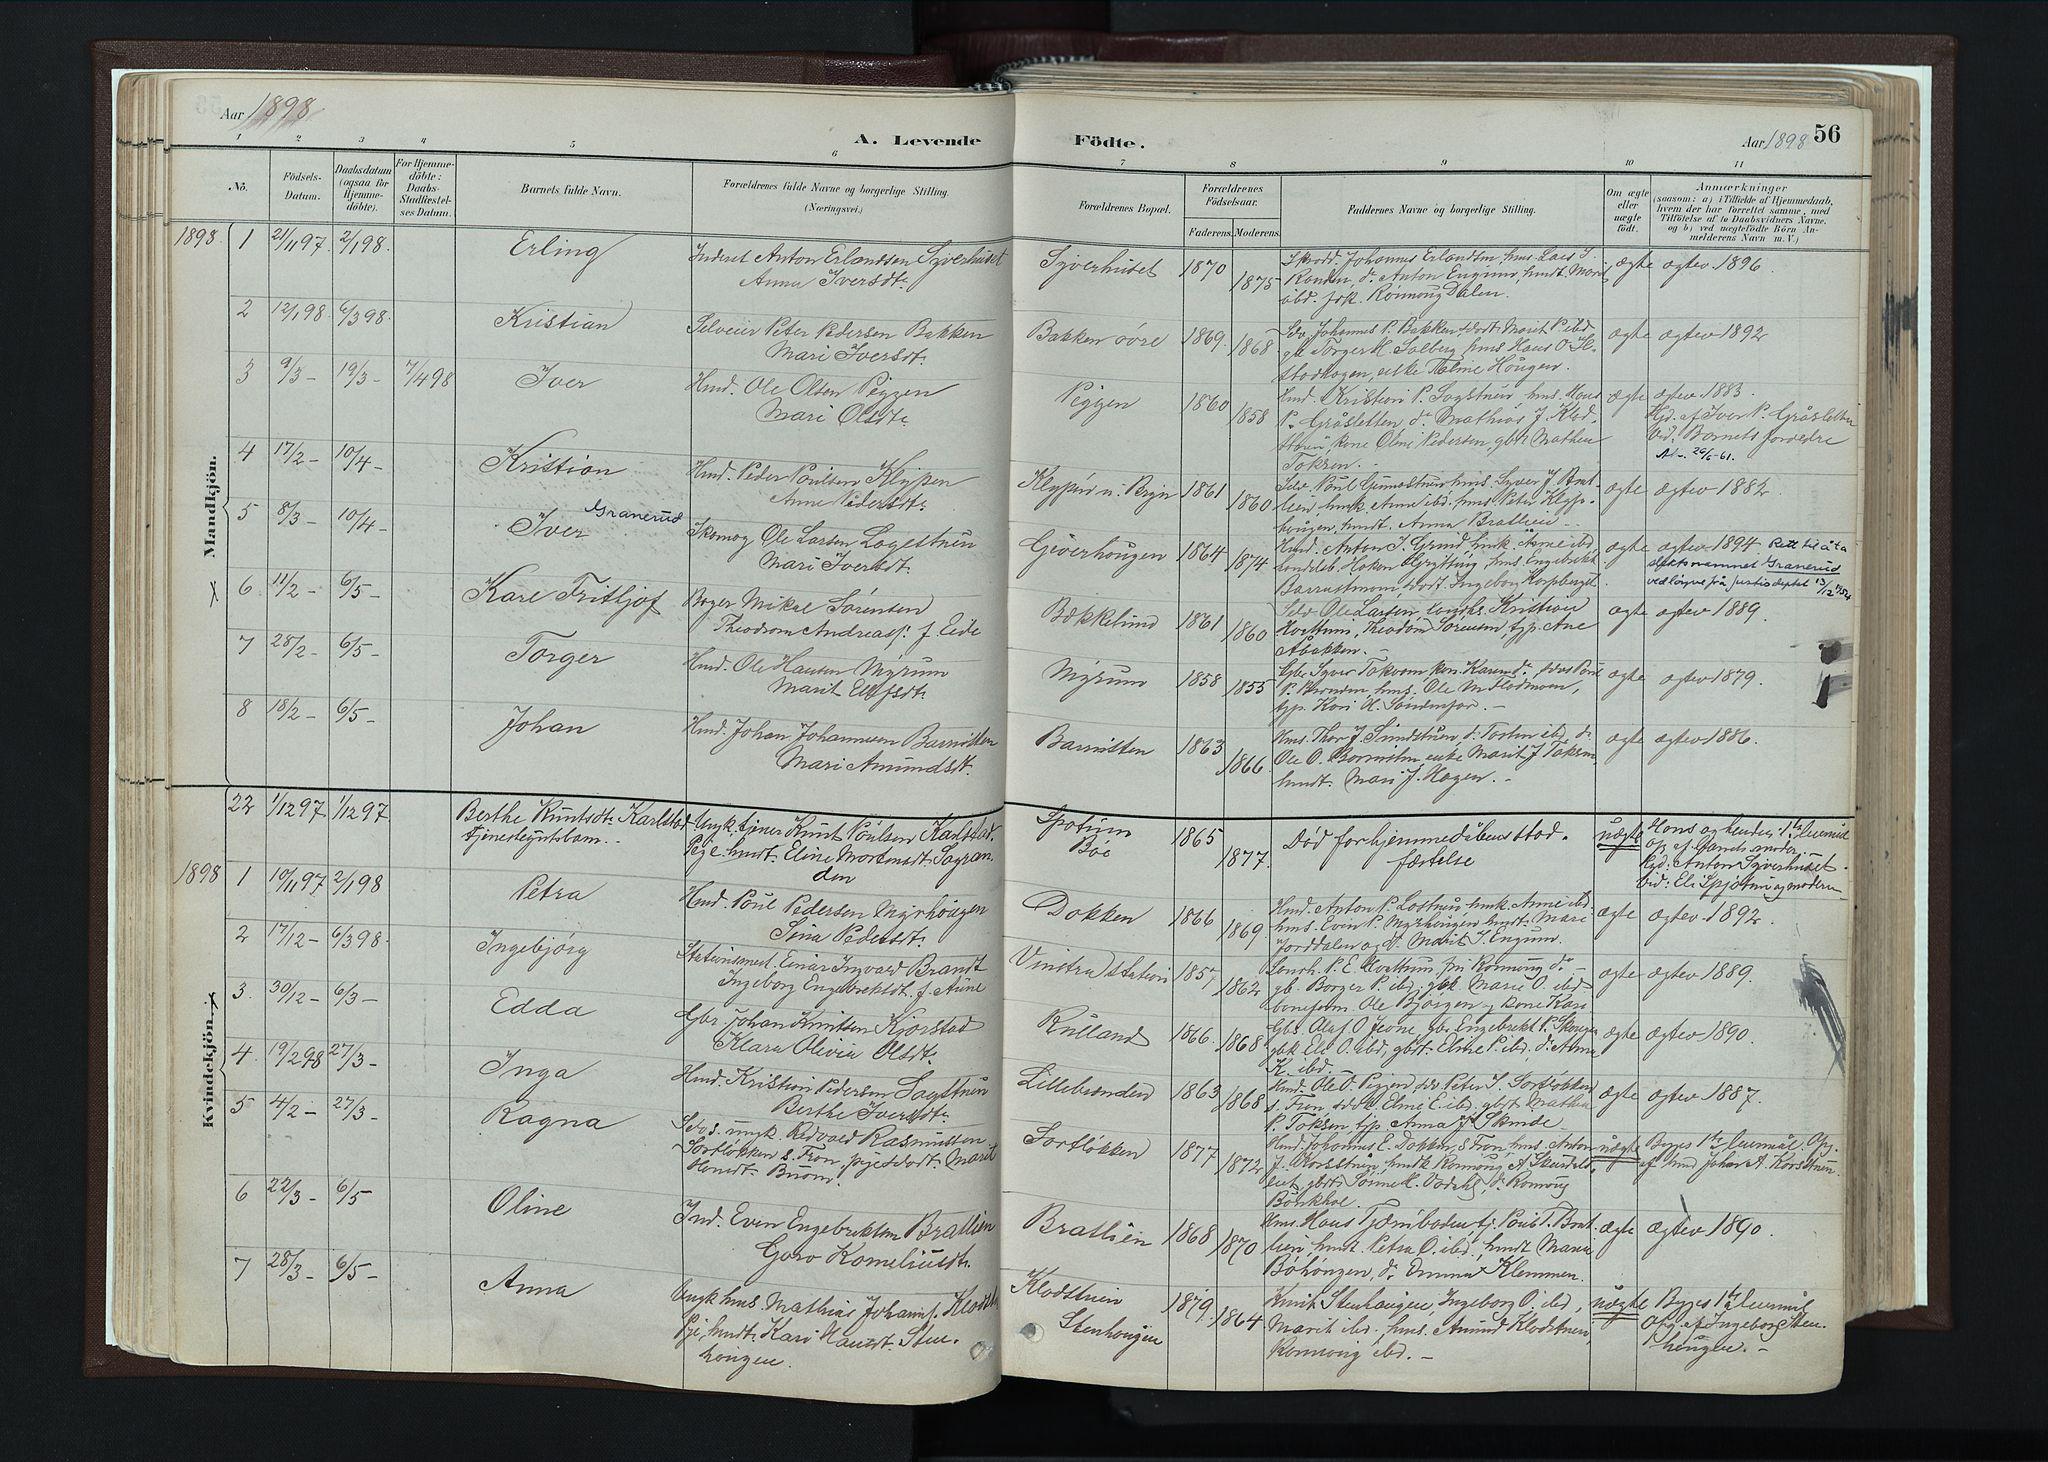 SAH, Nord-Fron prestekontor, Ministerialbok nr. 4, 1884-1914, s. 56